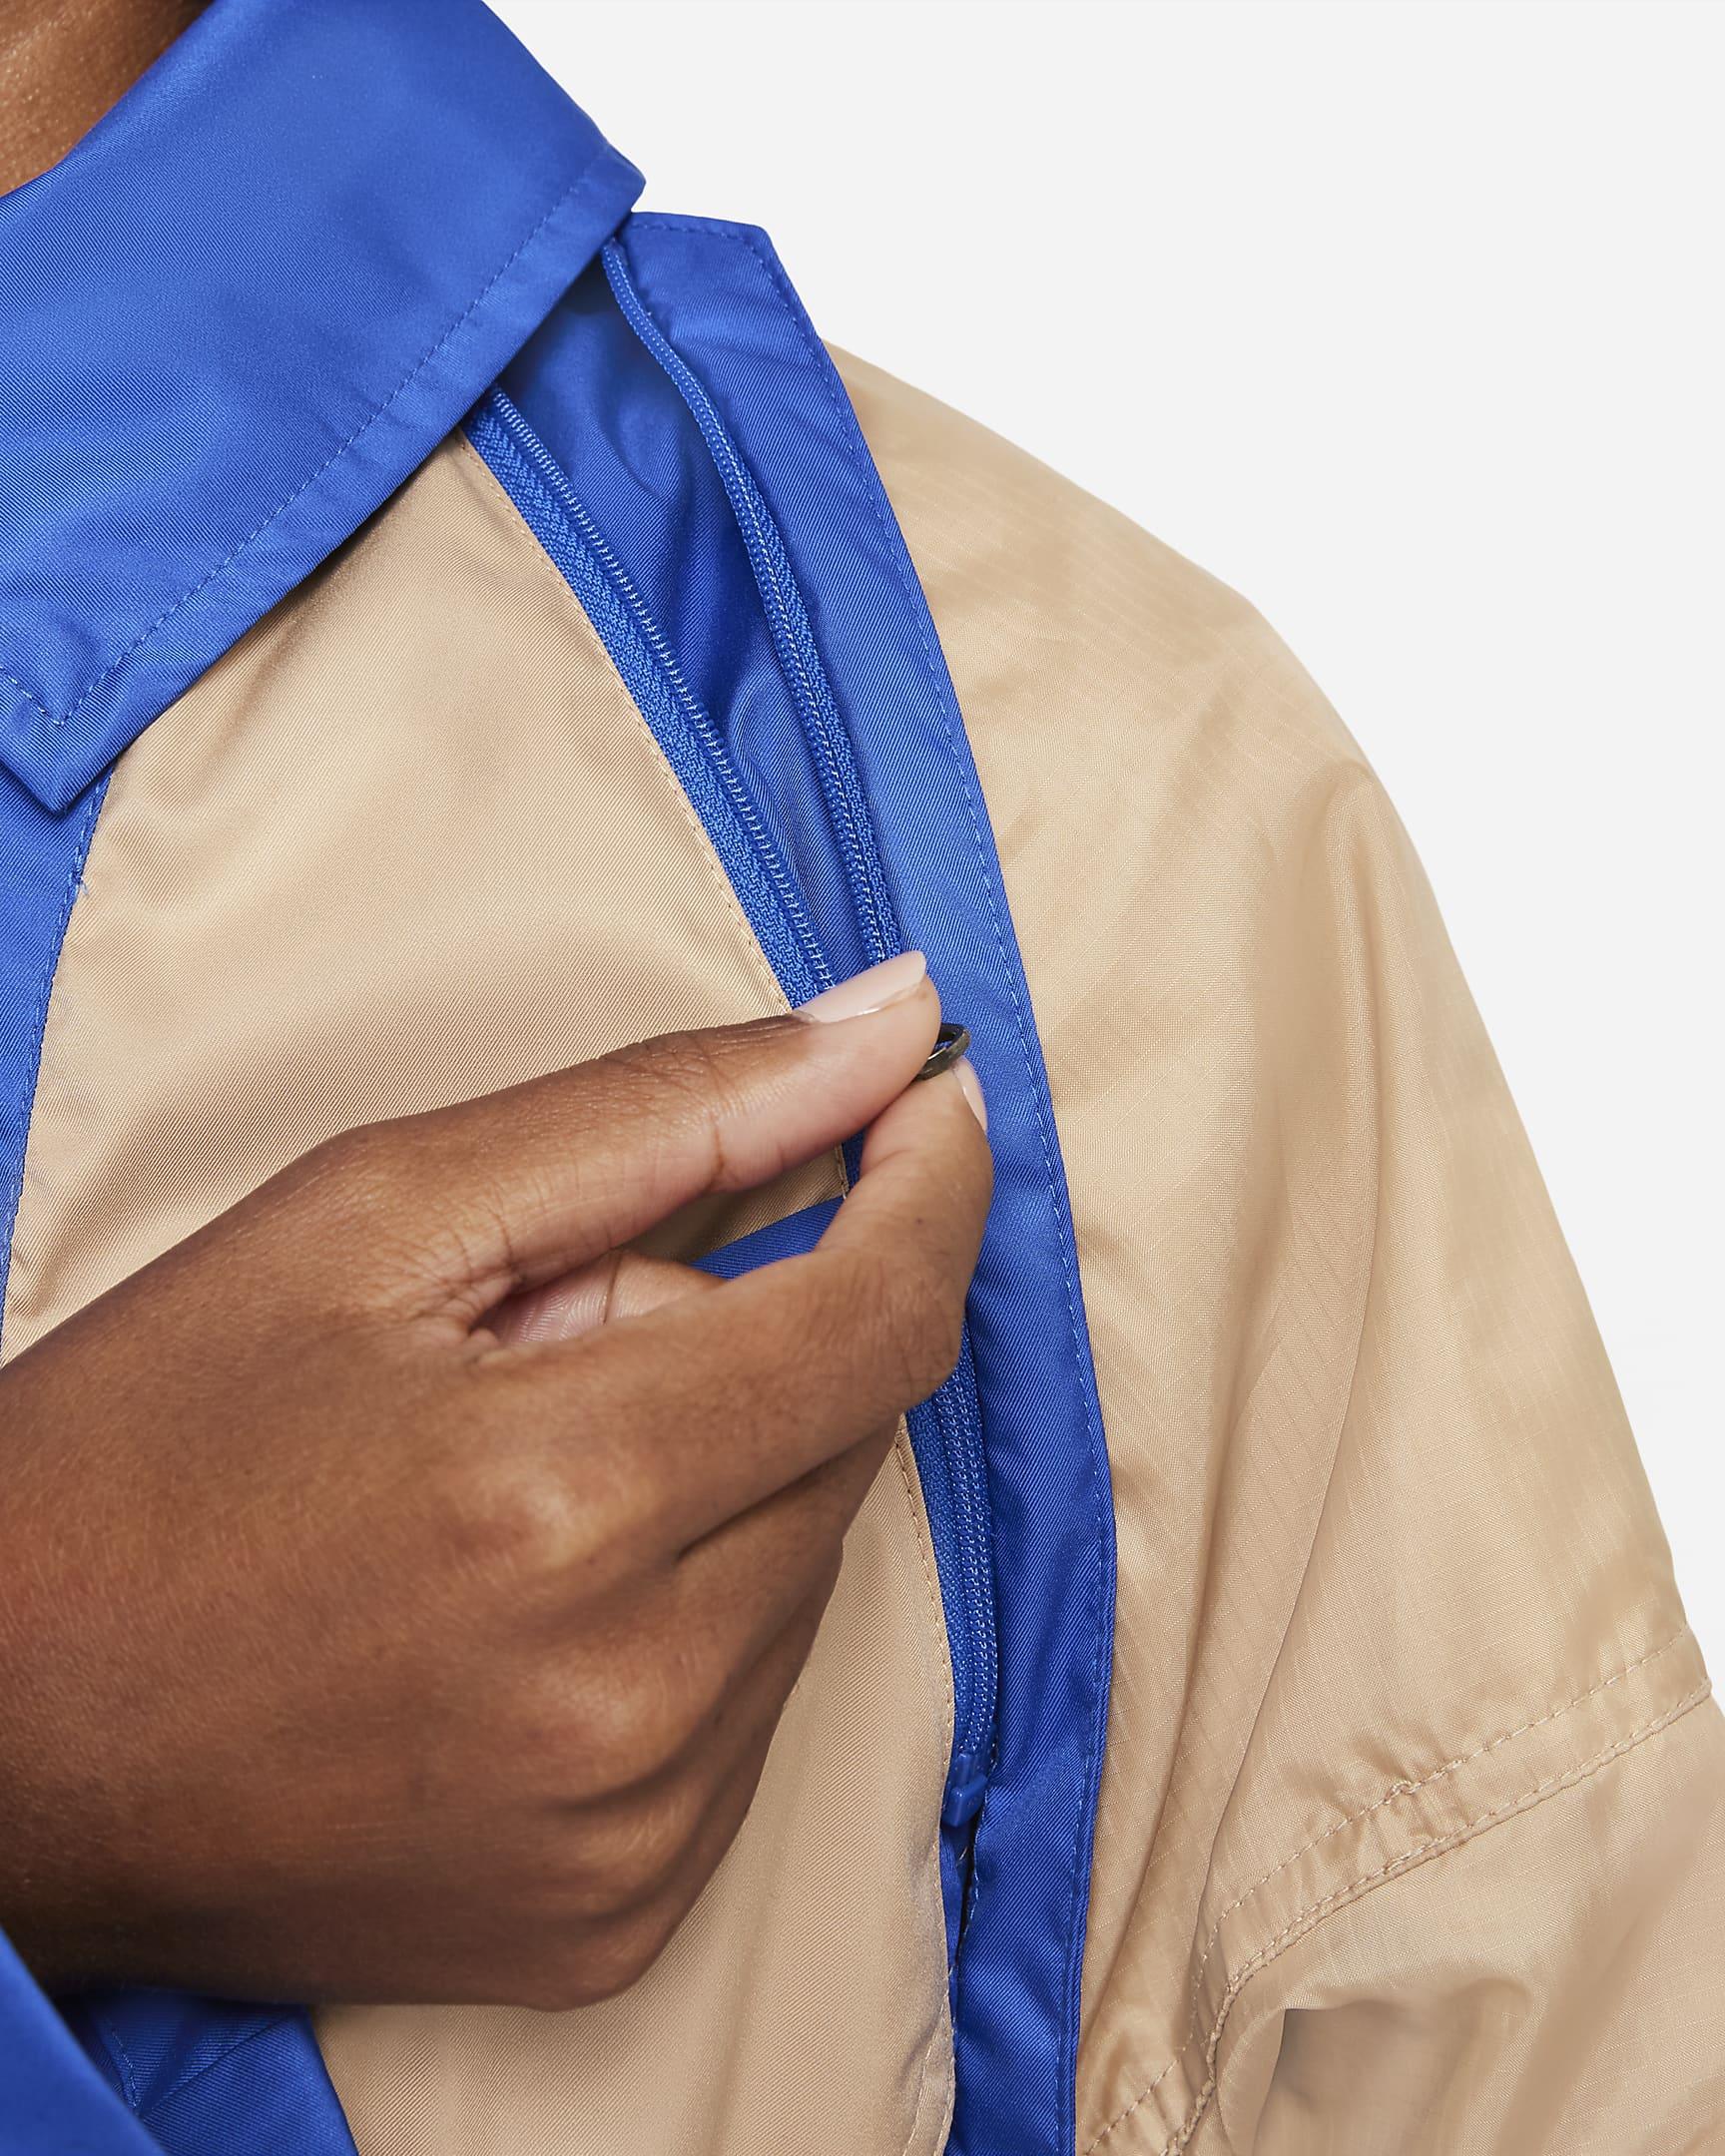 jordan-next-utility-capsule-womens-jacket-rhM8Kn-1.png